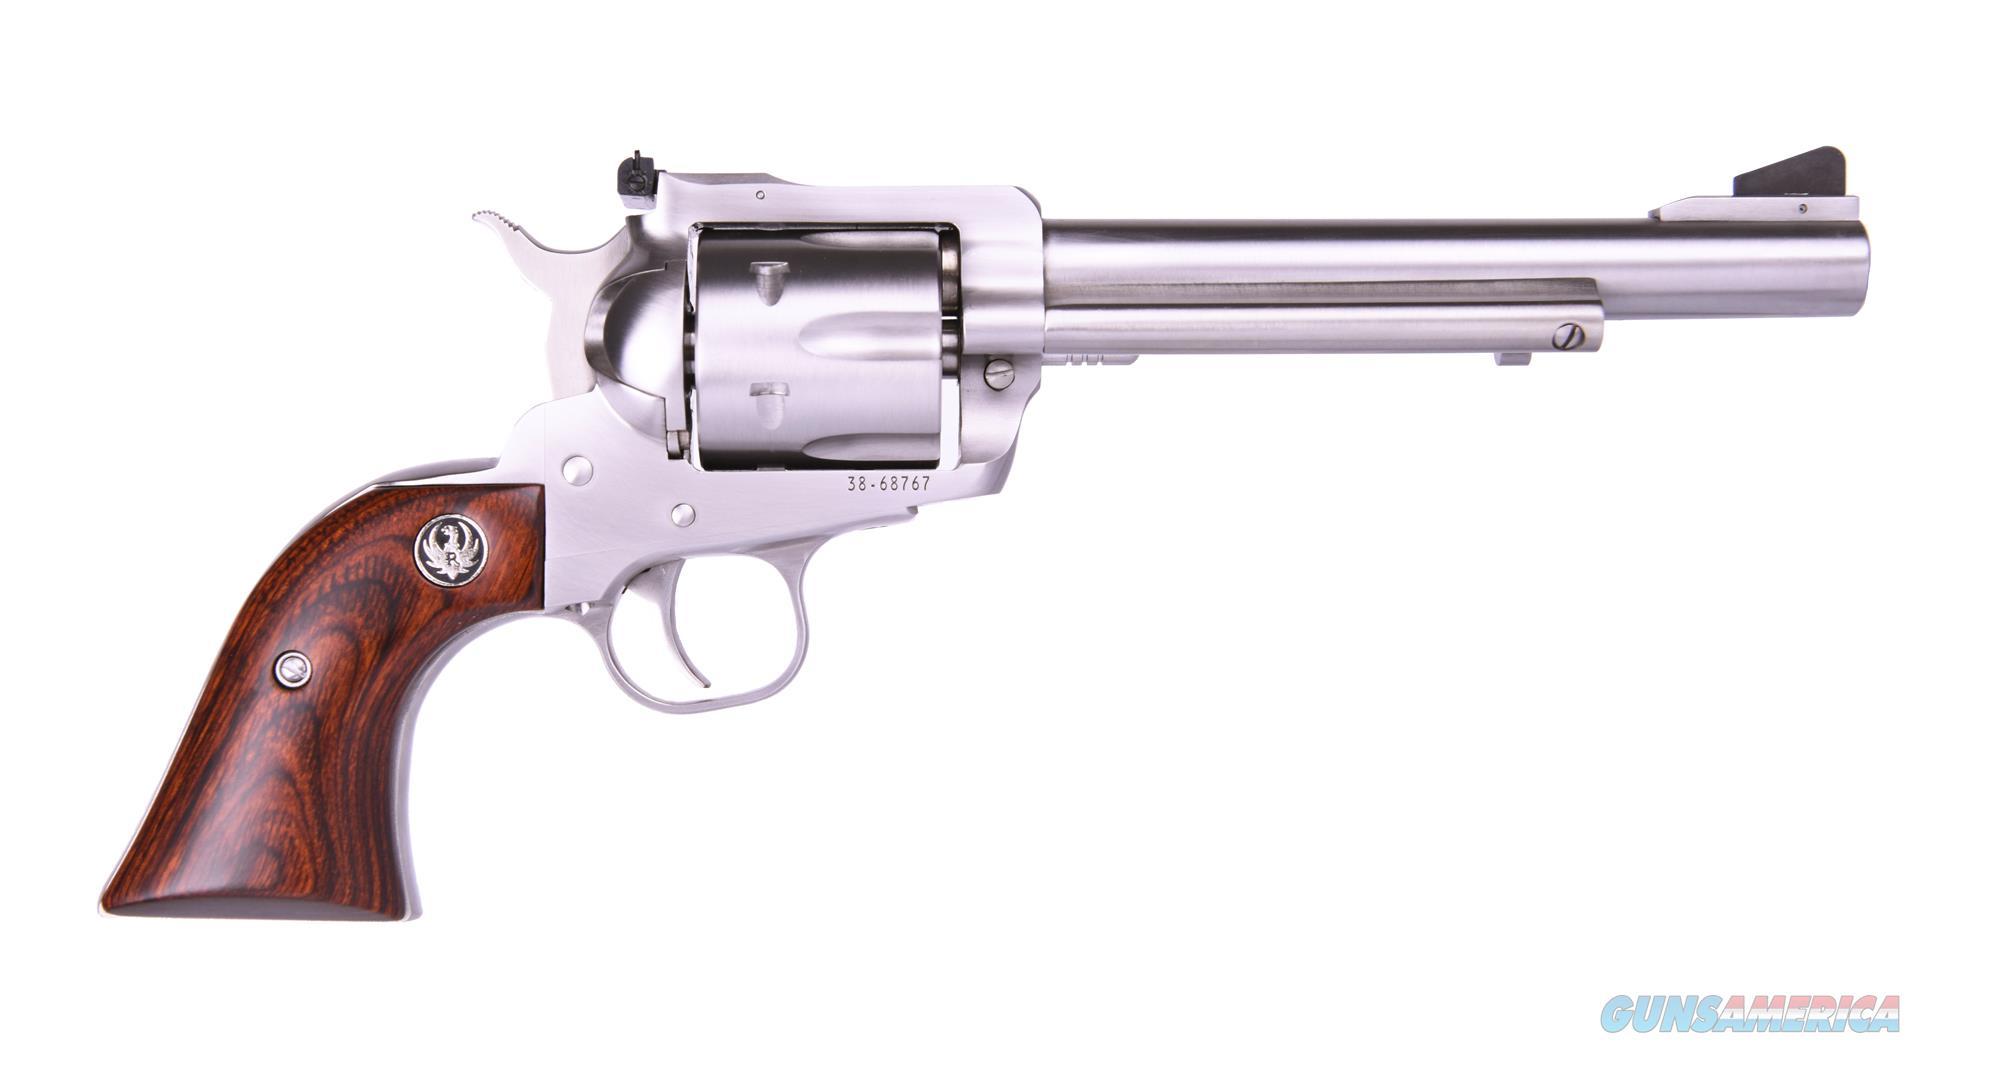 Ruger BLKHAWK CONV 10MM/40SW 6.5 SS 0474 LARGE FRAME BLACKHAWK  Guns > Pistols > Ruger Single Action Revolvers > Single Six Type